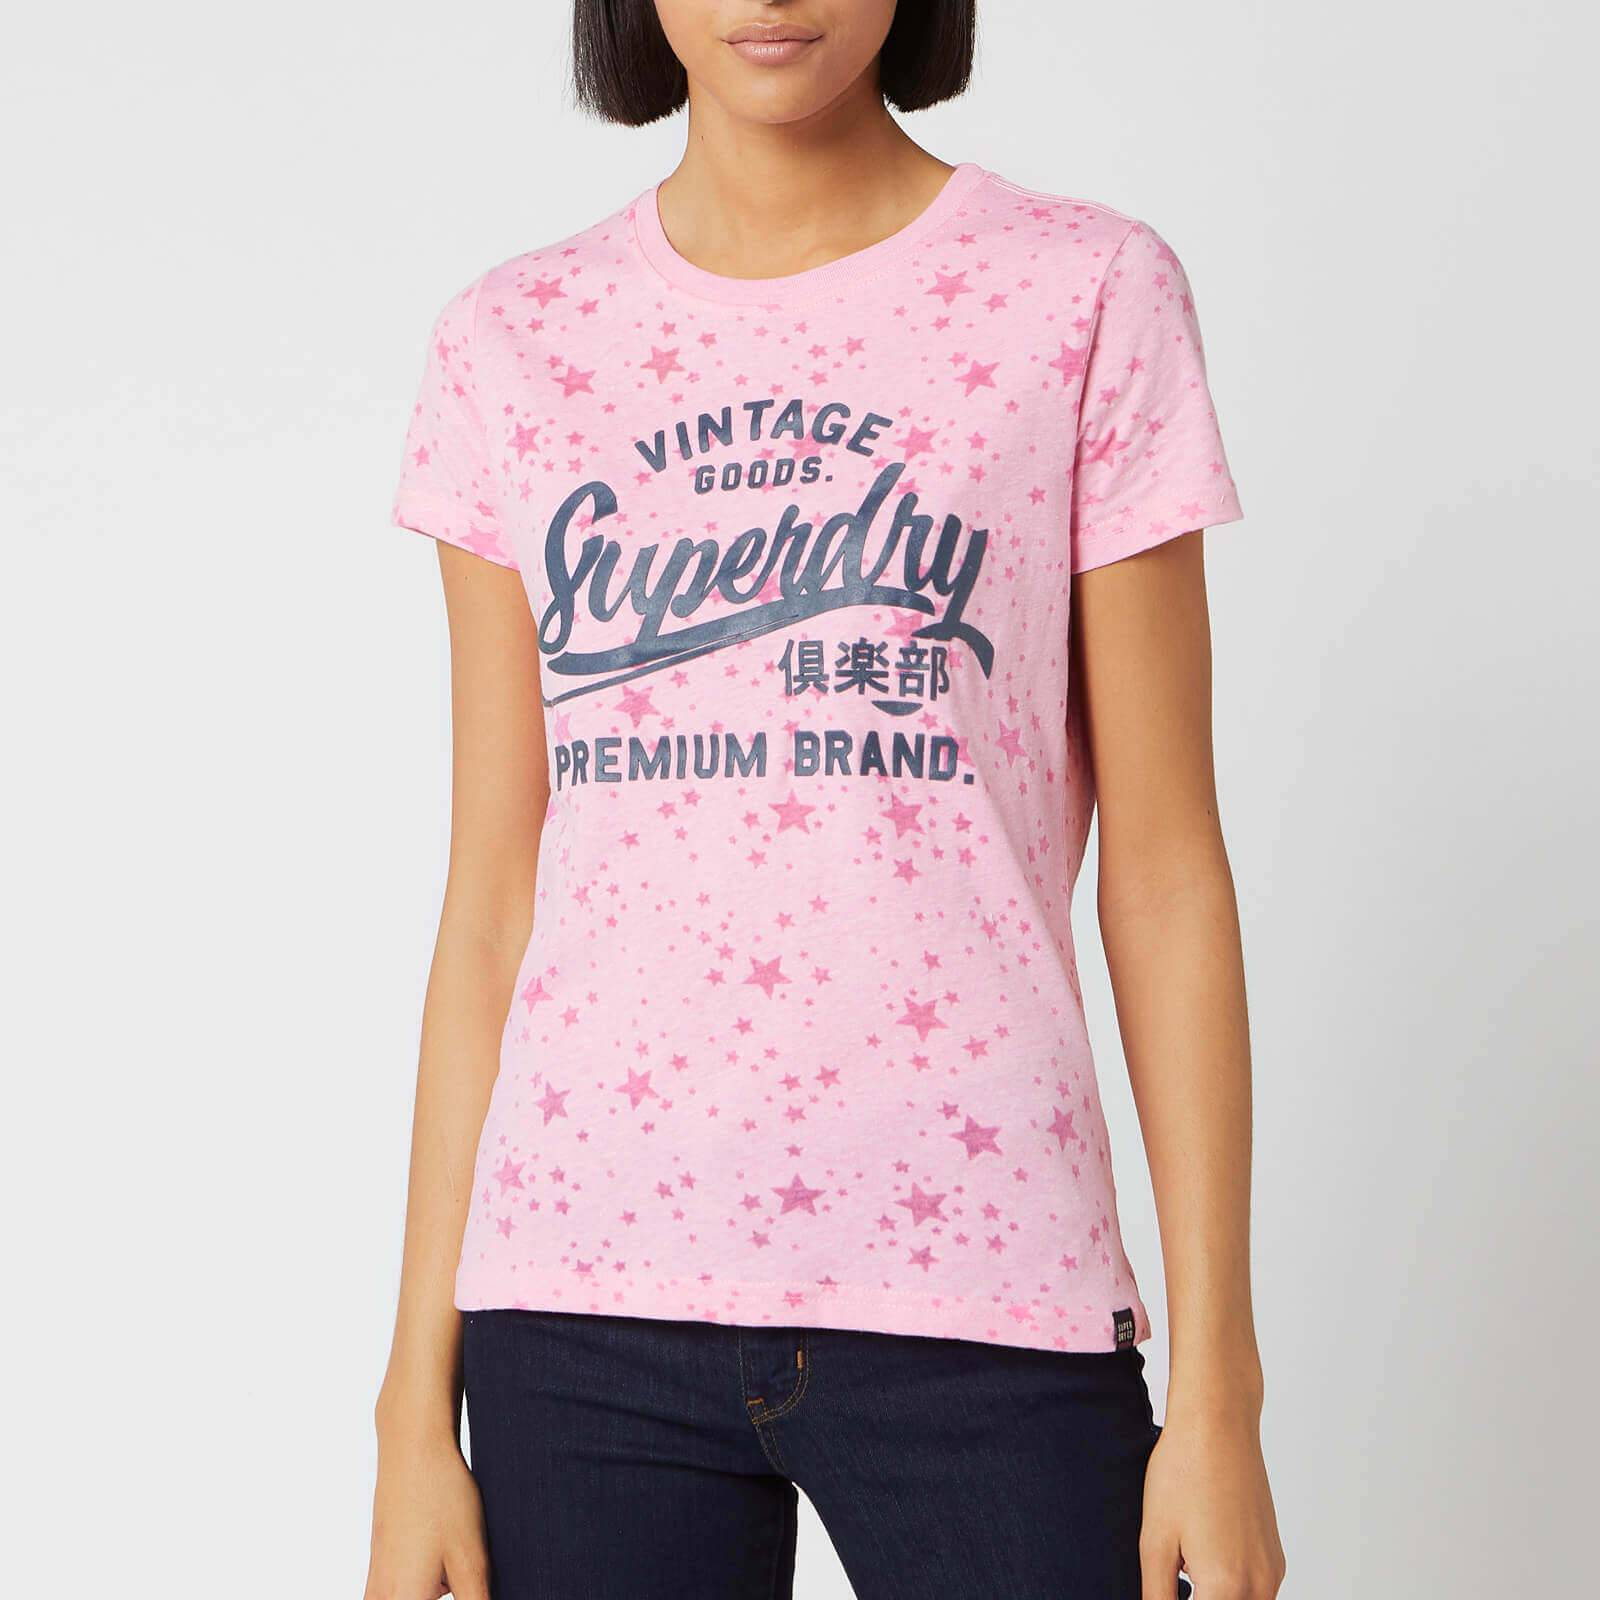 Superdry Women's Vintage Goods Star Aop Entry T-Shirt - Cherry Blossom Burn Out - UK 14 - Pink